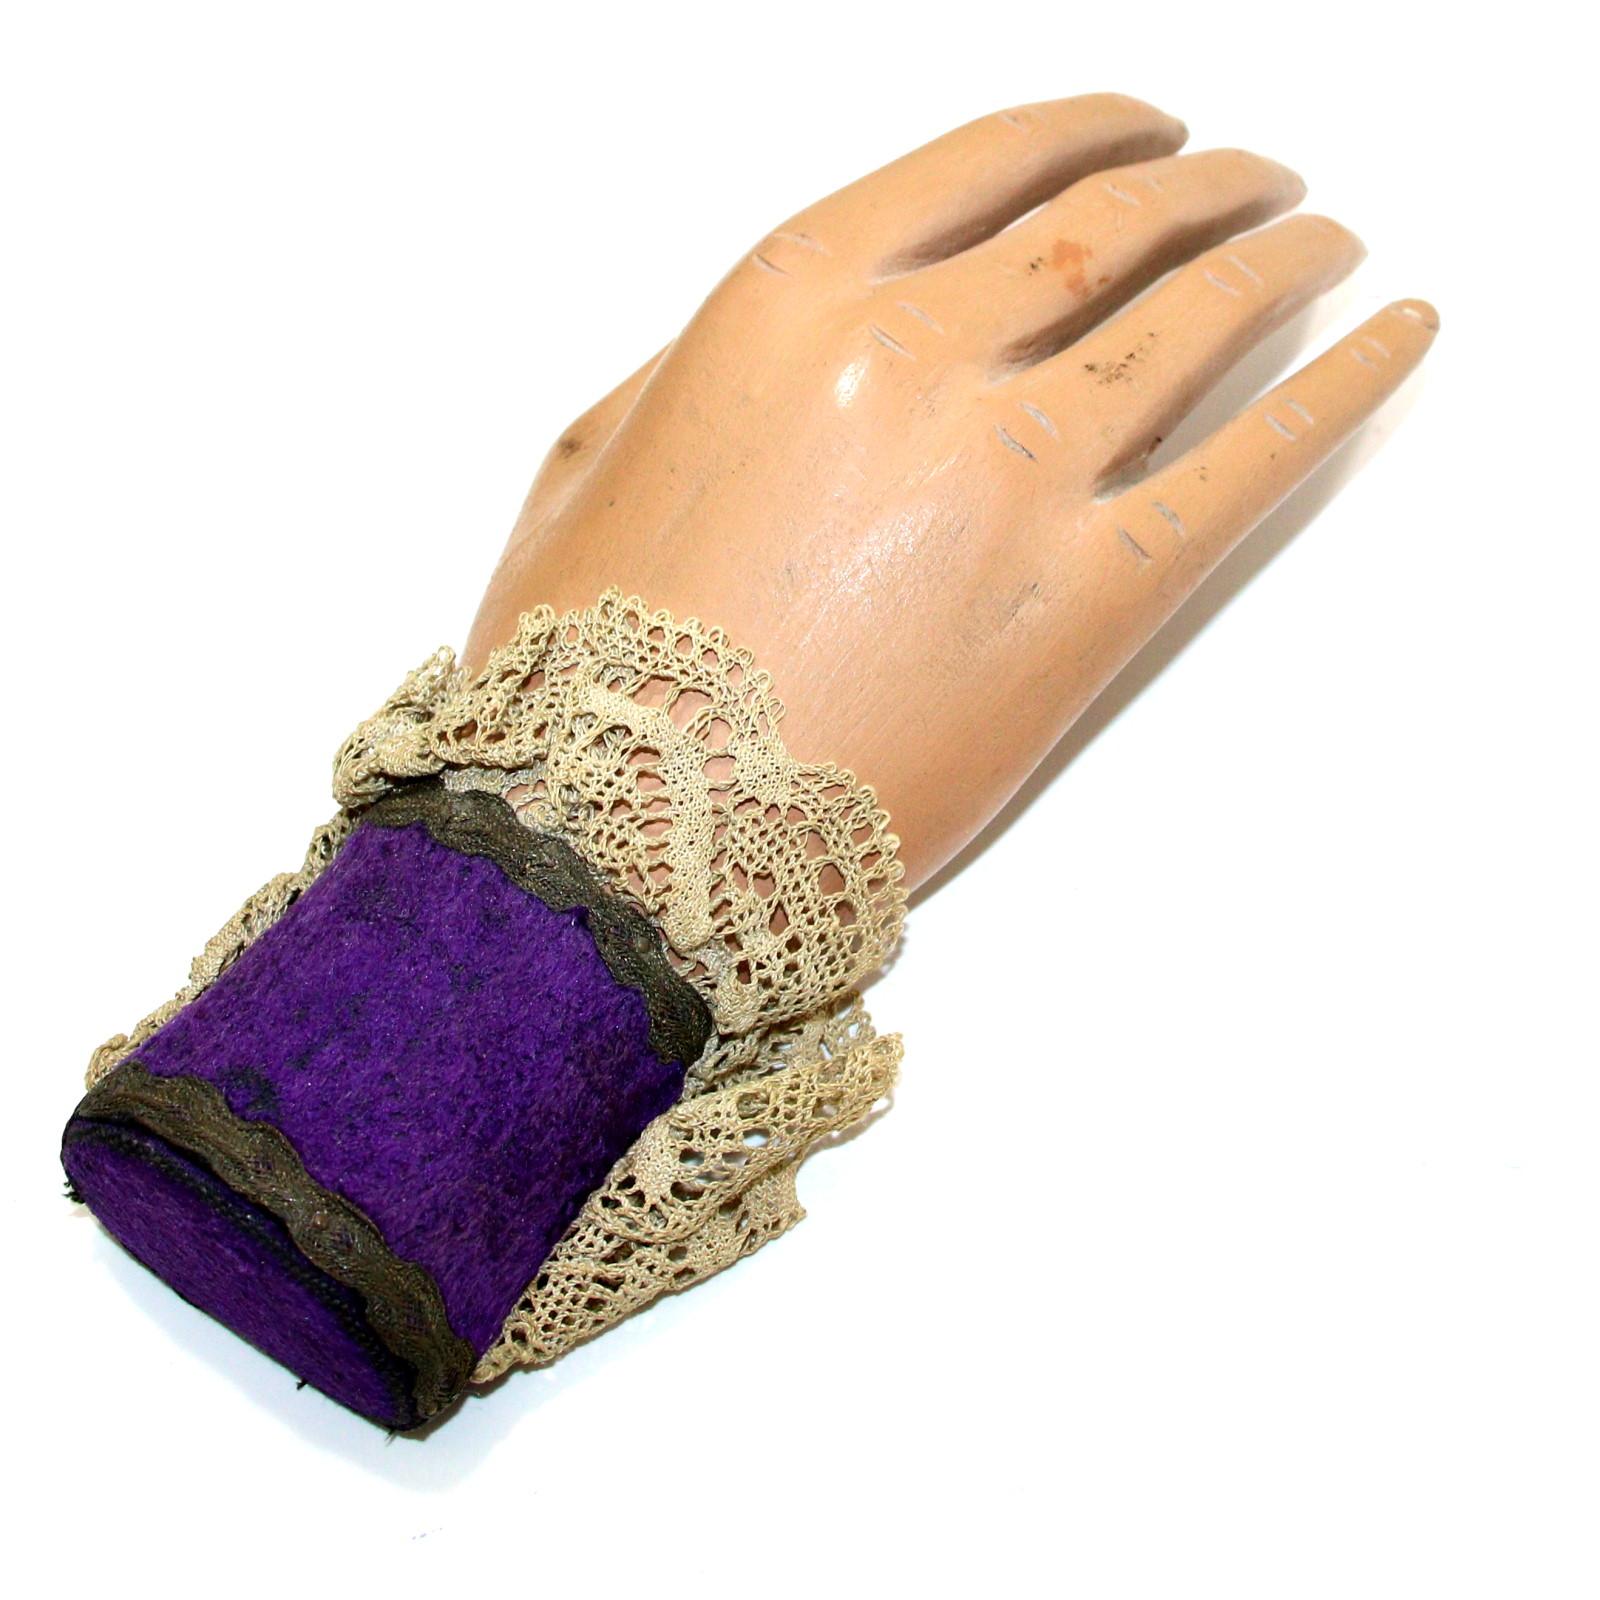 Dr. Q Spirit Hand by Thayer Quality Magic